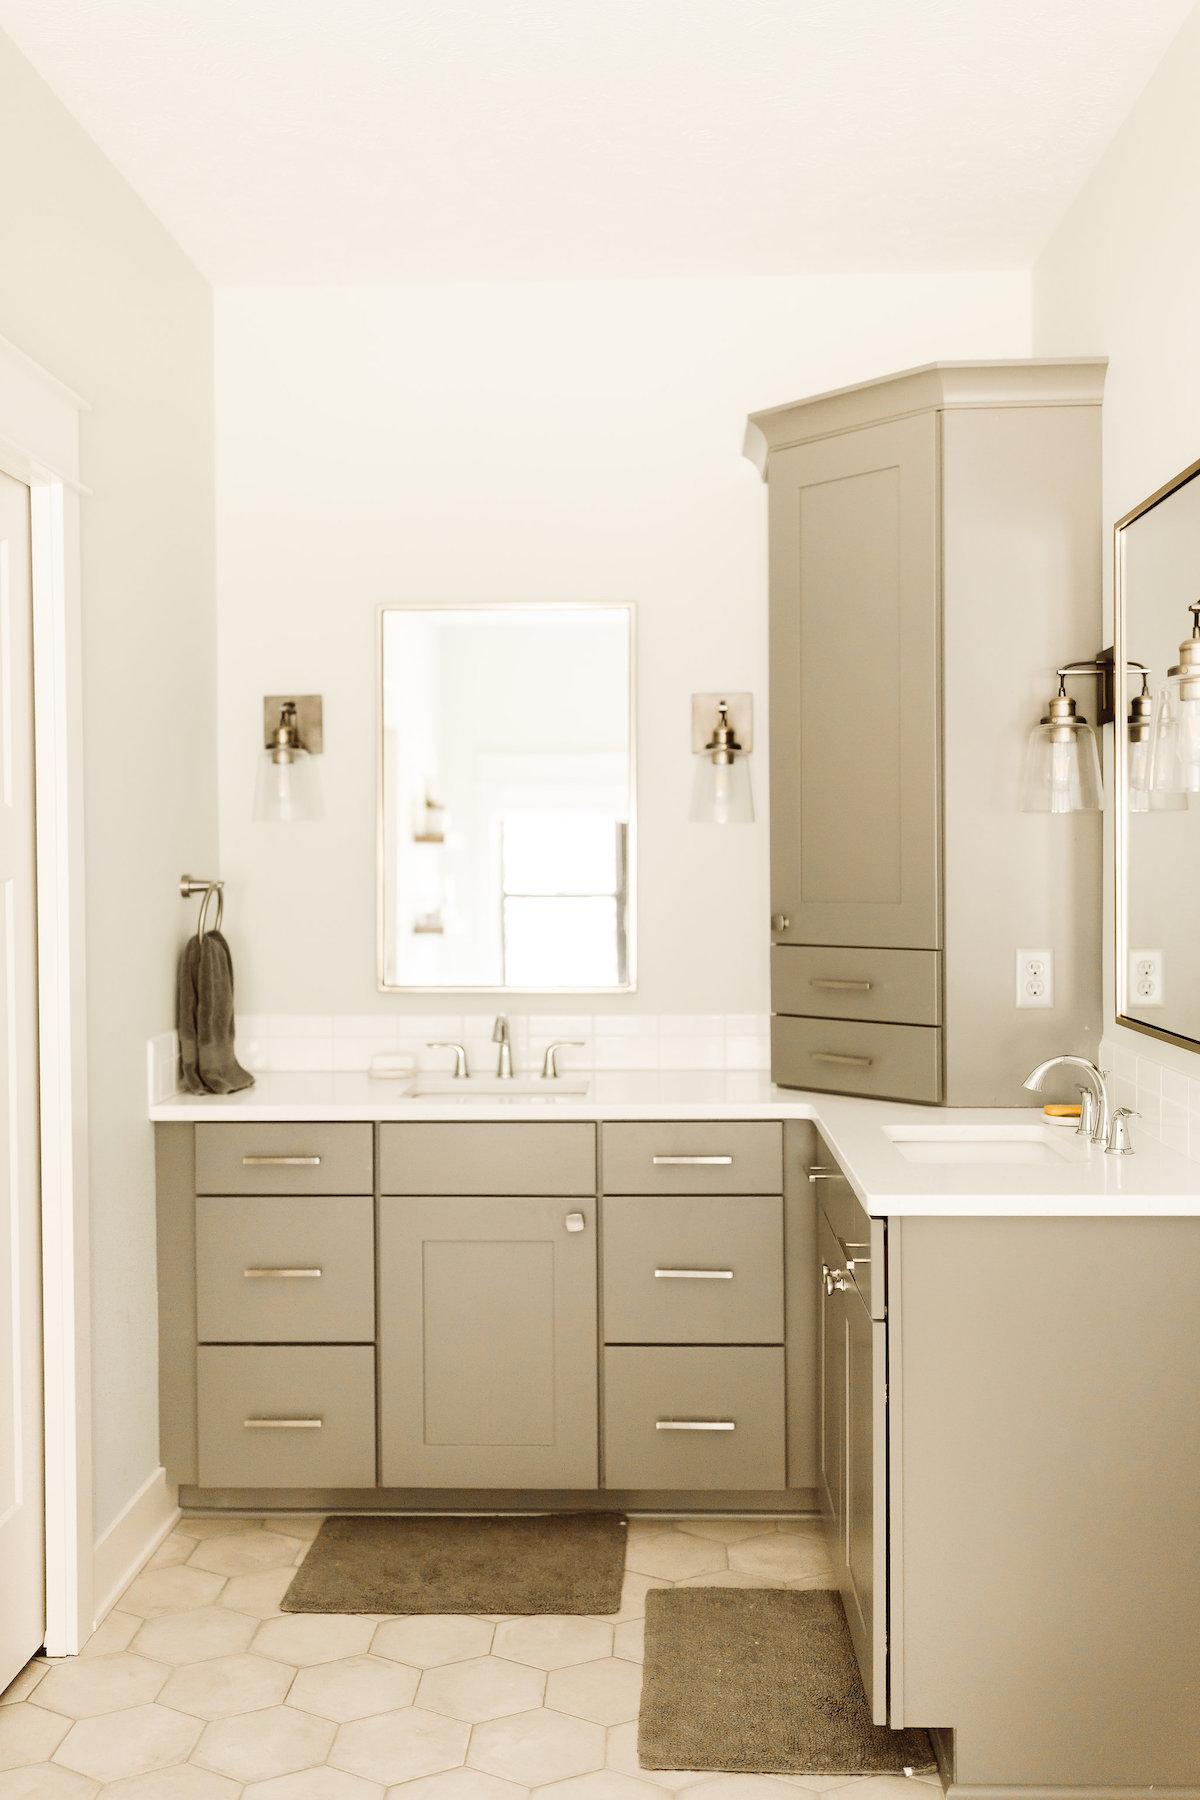 Modern Farmhouse New Build -Master Bath - Kate Brock Interiors